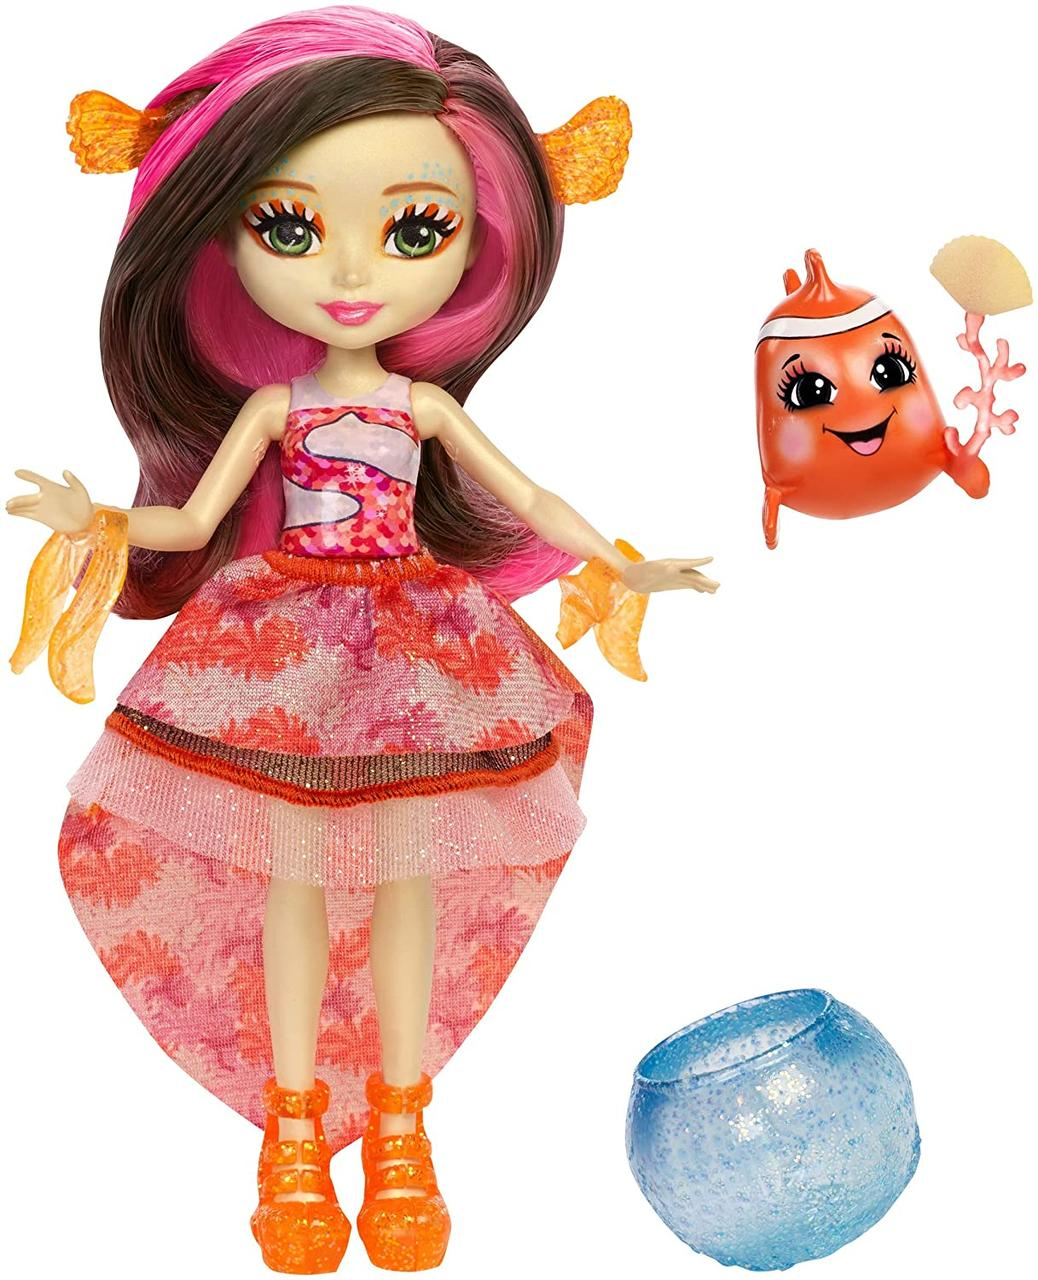 Кукла Энчантималс рыба клоун Кларита Enchantimals Clarita Clownfish Dolls меняет цвет волос клоуфиш оригинал